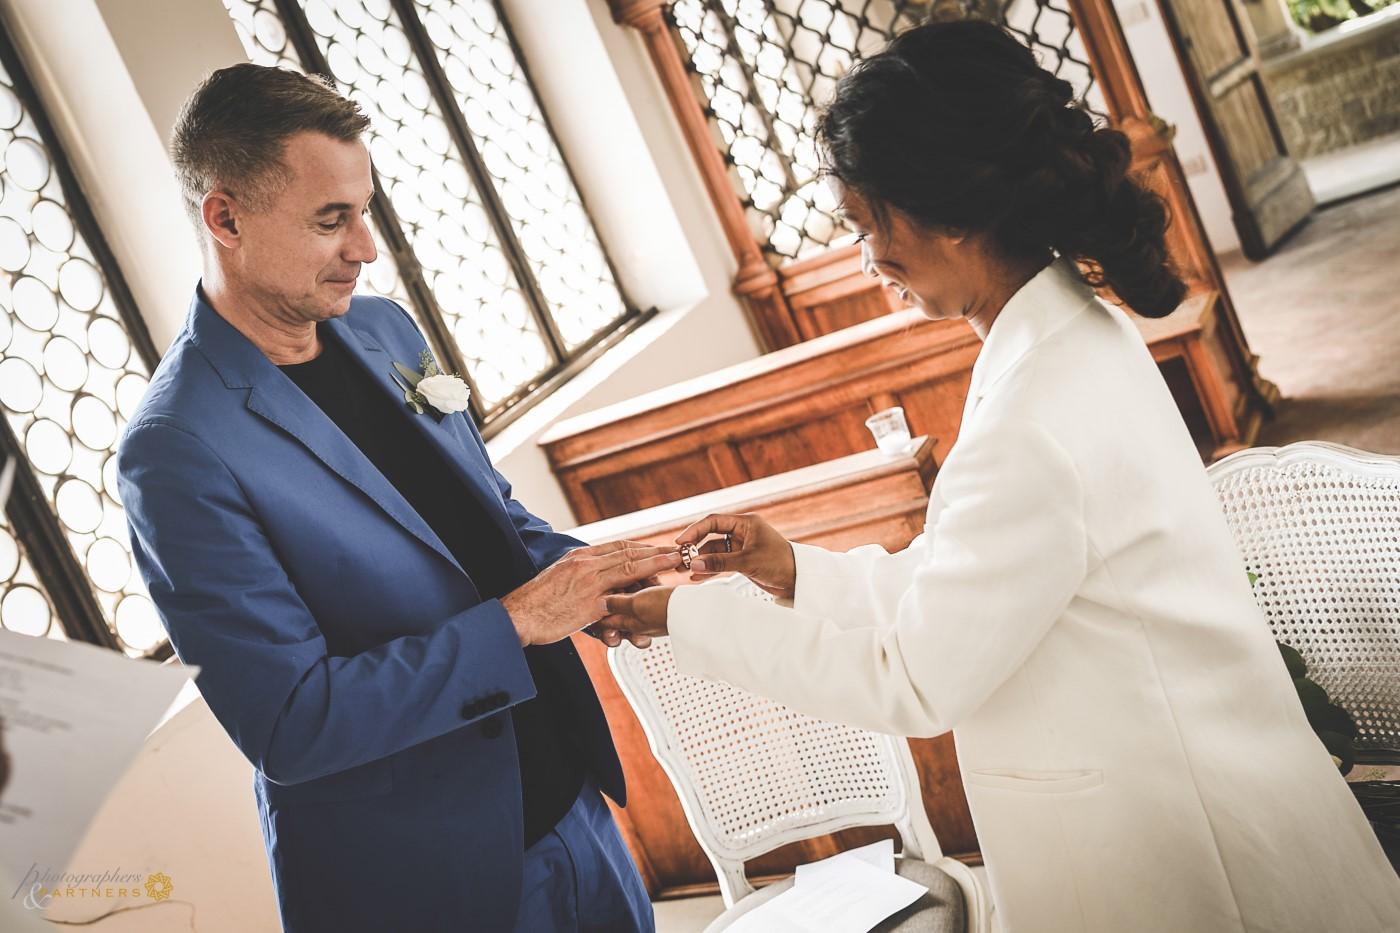 Bride's ring.